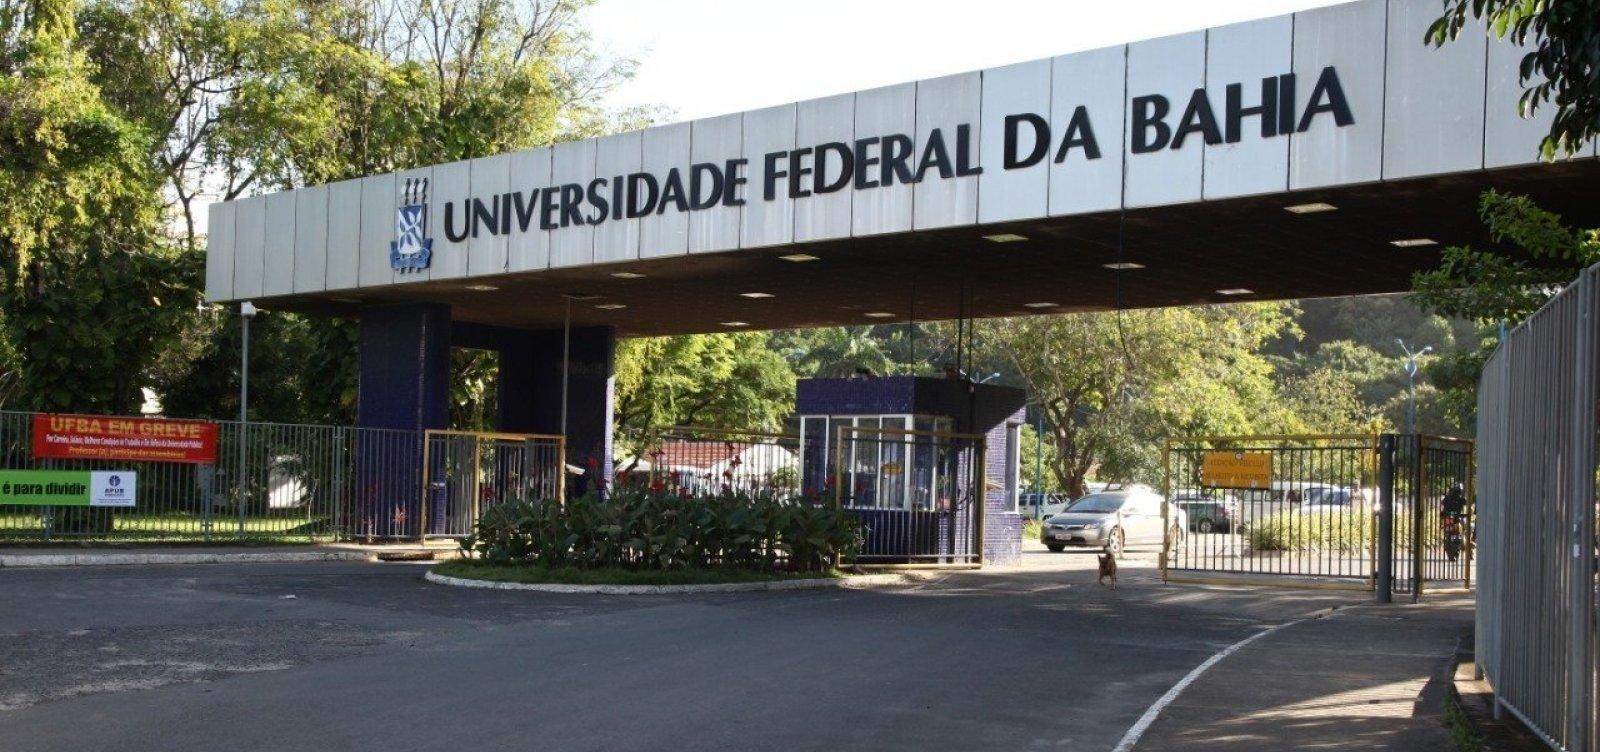 Ranking Times Higher Education Latin América: Ufba ocupa 26º lugar entre as 177 universidades avaliadas